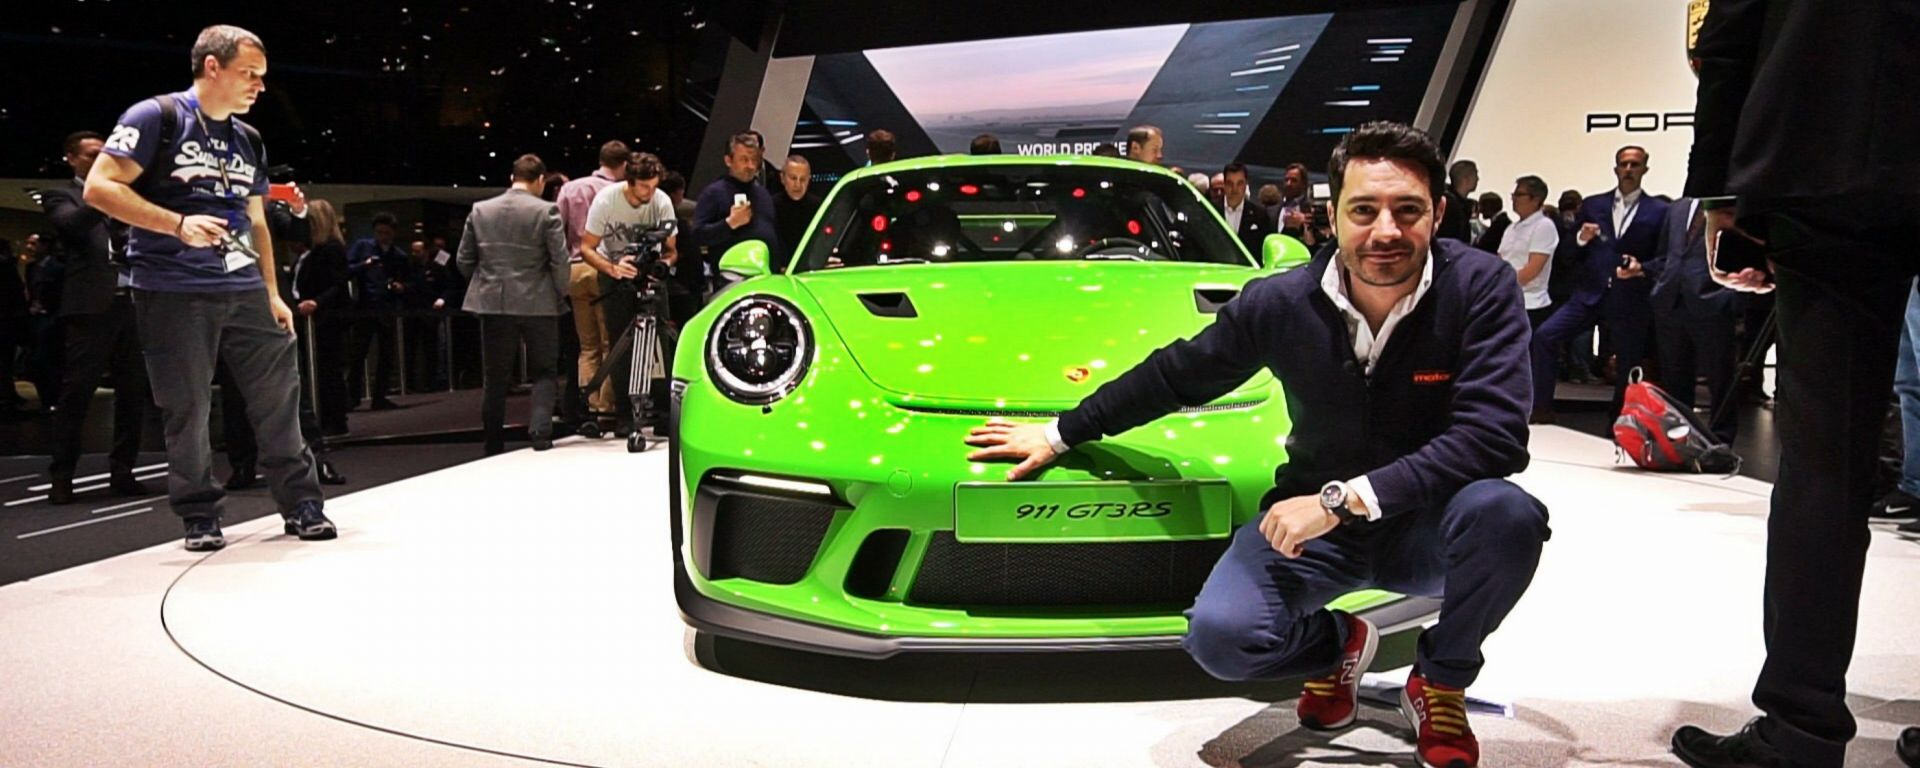 Nuova Porsche 911 GT3 RS: in video dal Salone di Ginevra 2018